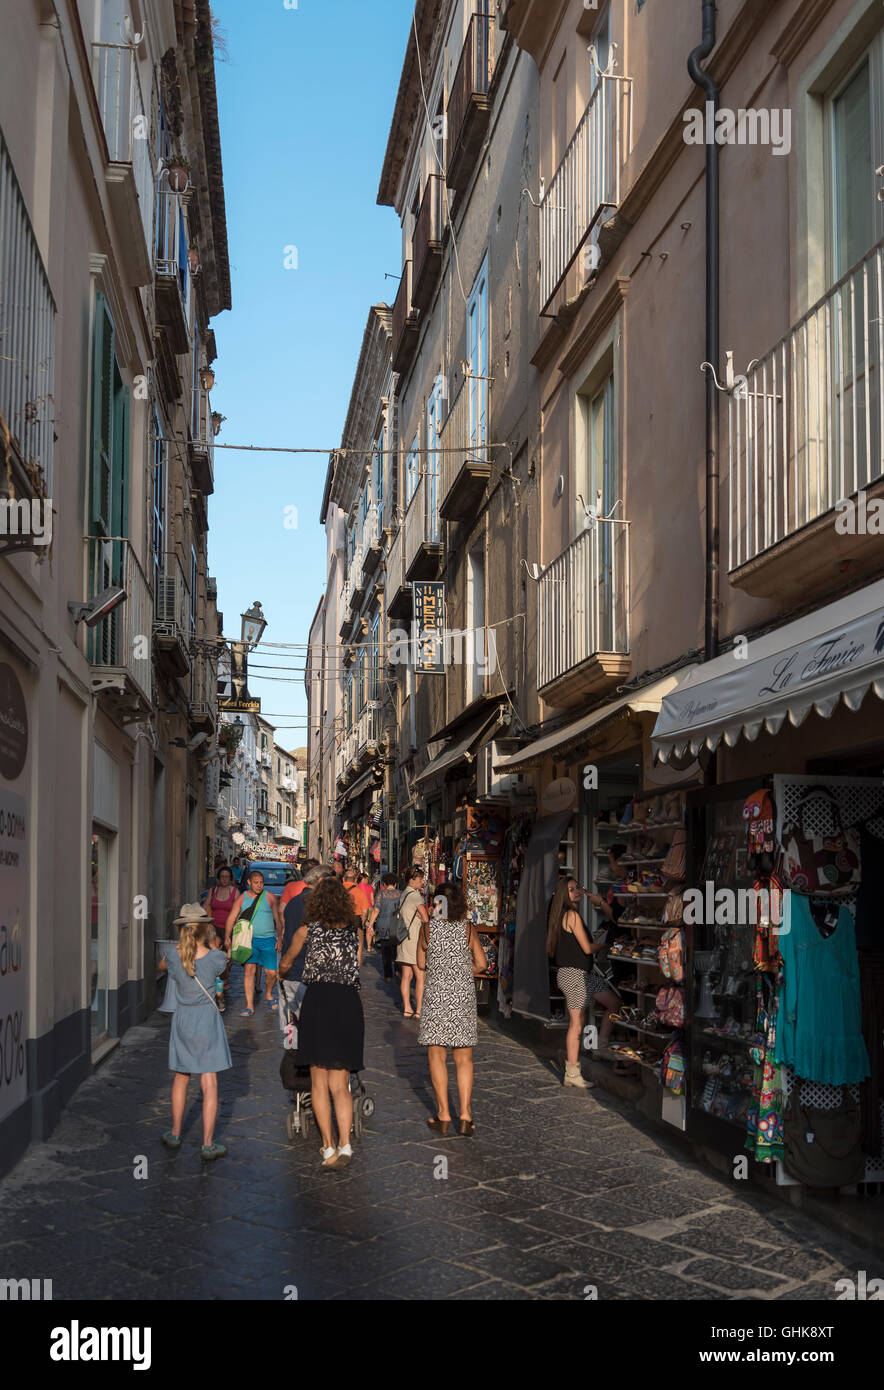 Street scene, Tropea, Calabria, Italy Stock Photo